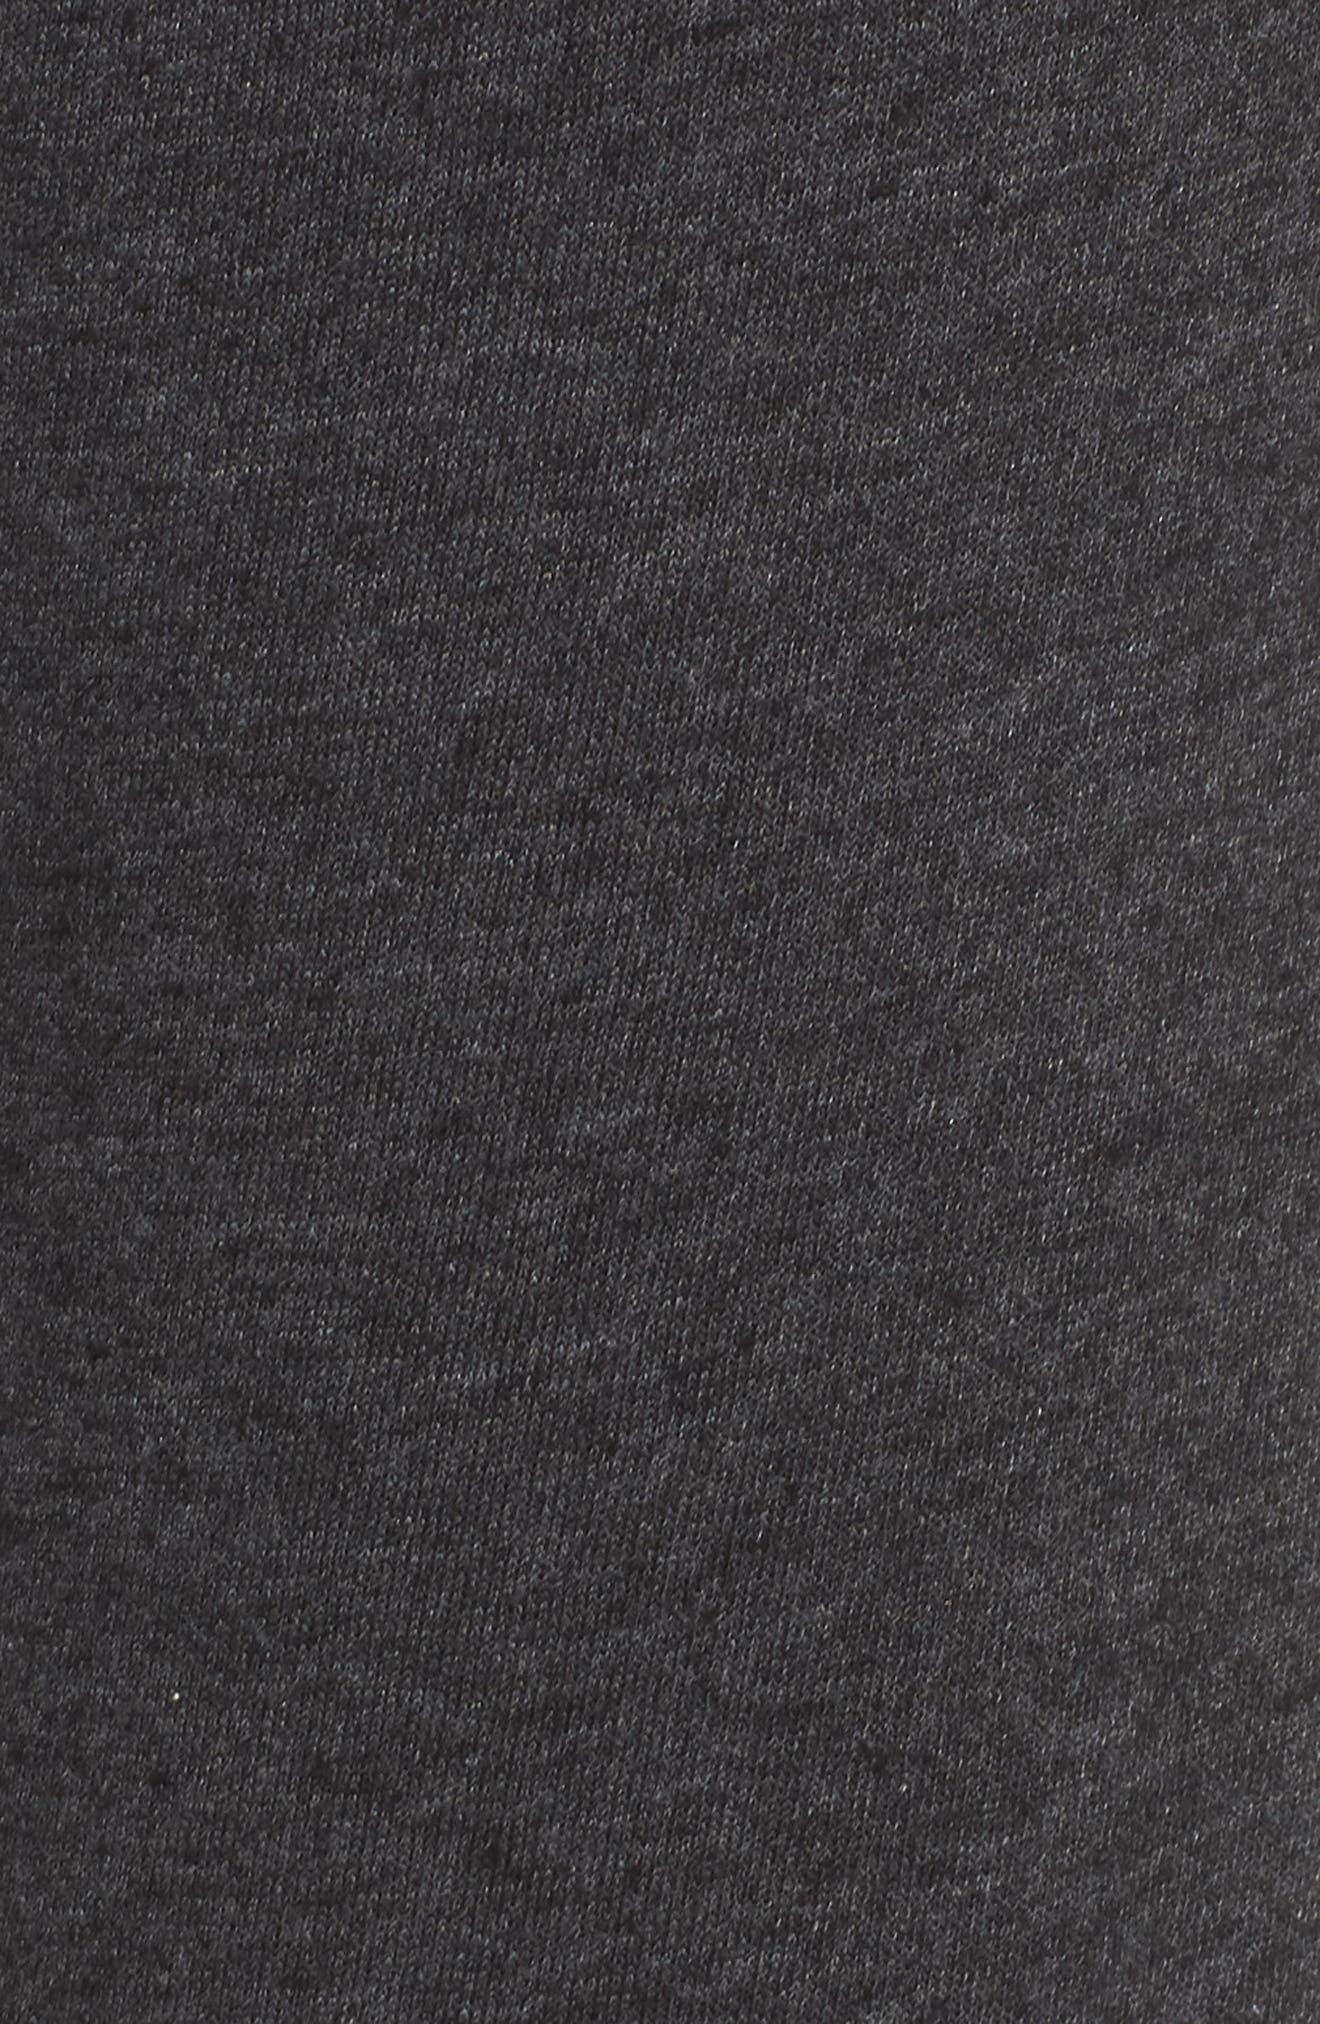 Grateful Perfect Knit Pants,                             Alternate thumbnail 3, color,                             Vntg Black